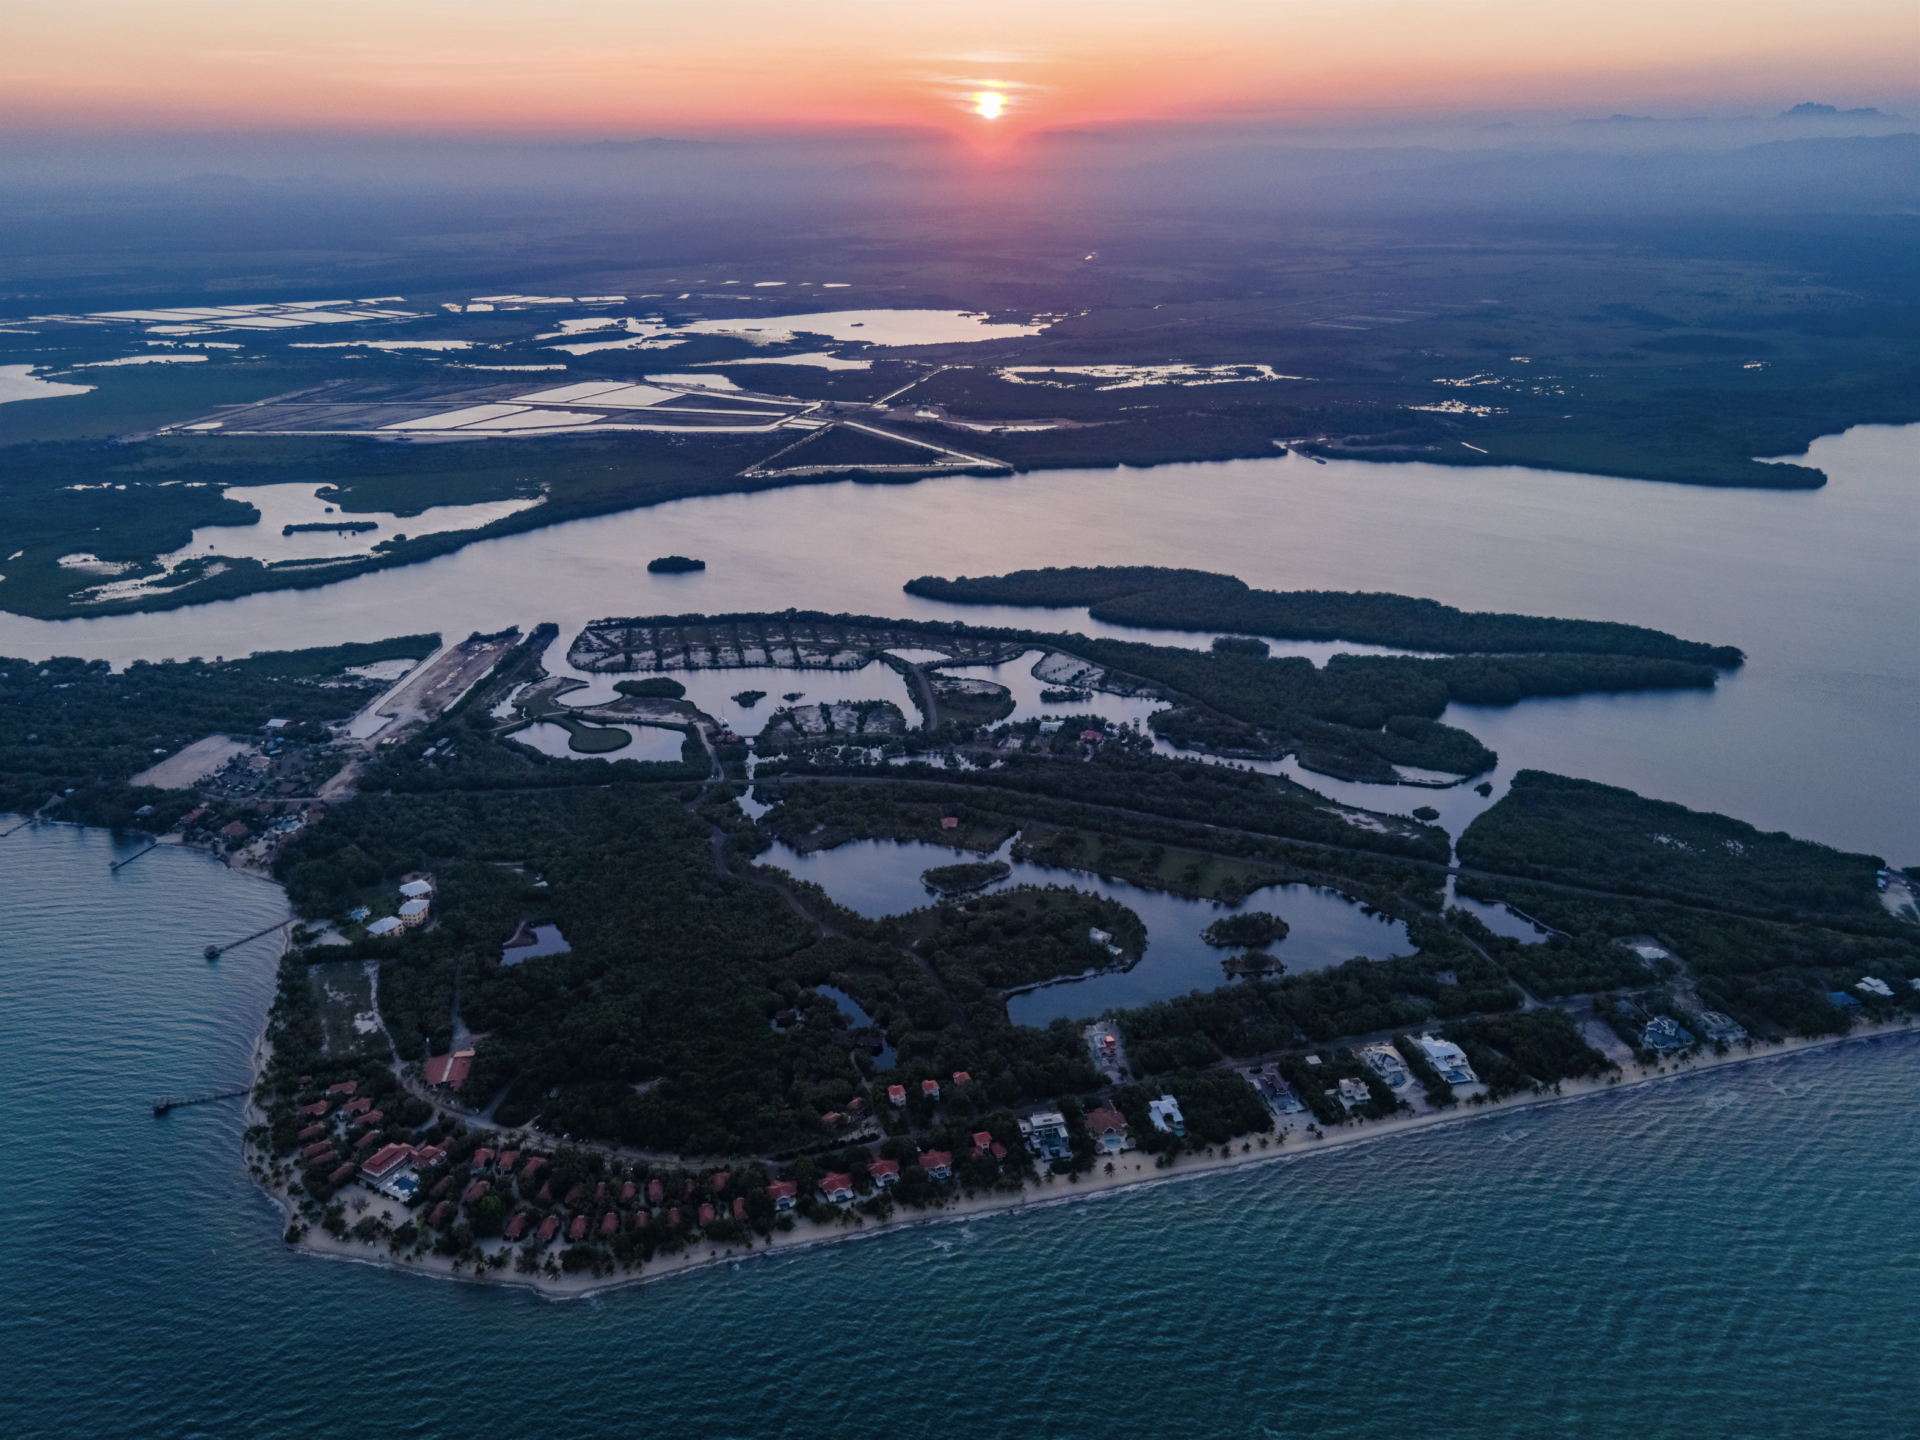 naia-resort-spa-placencia-belize-sunset-aerial